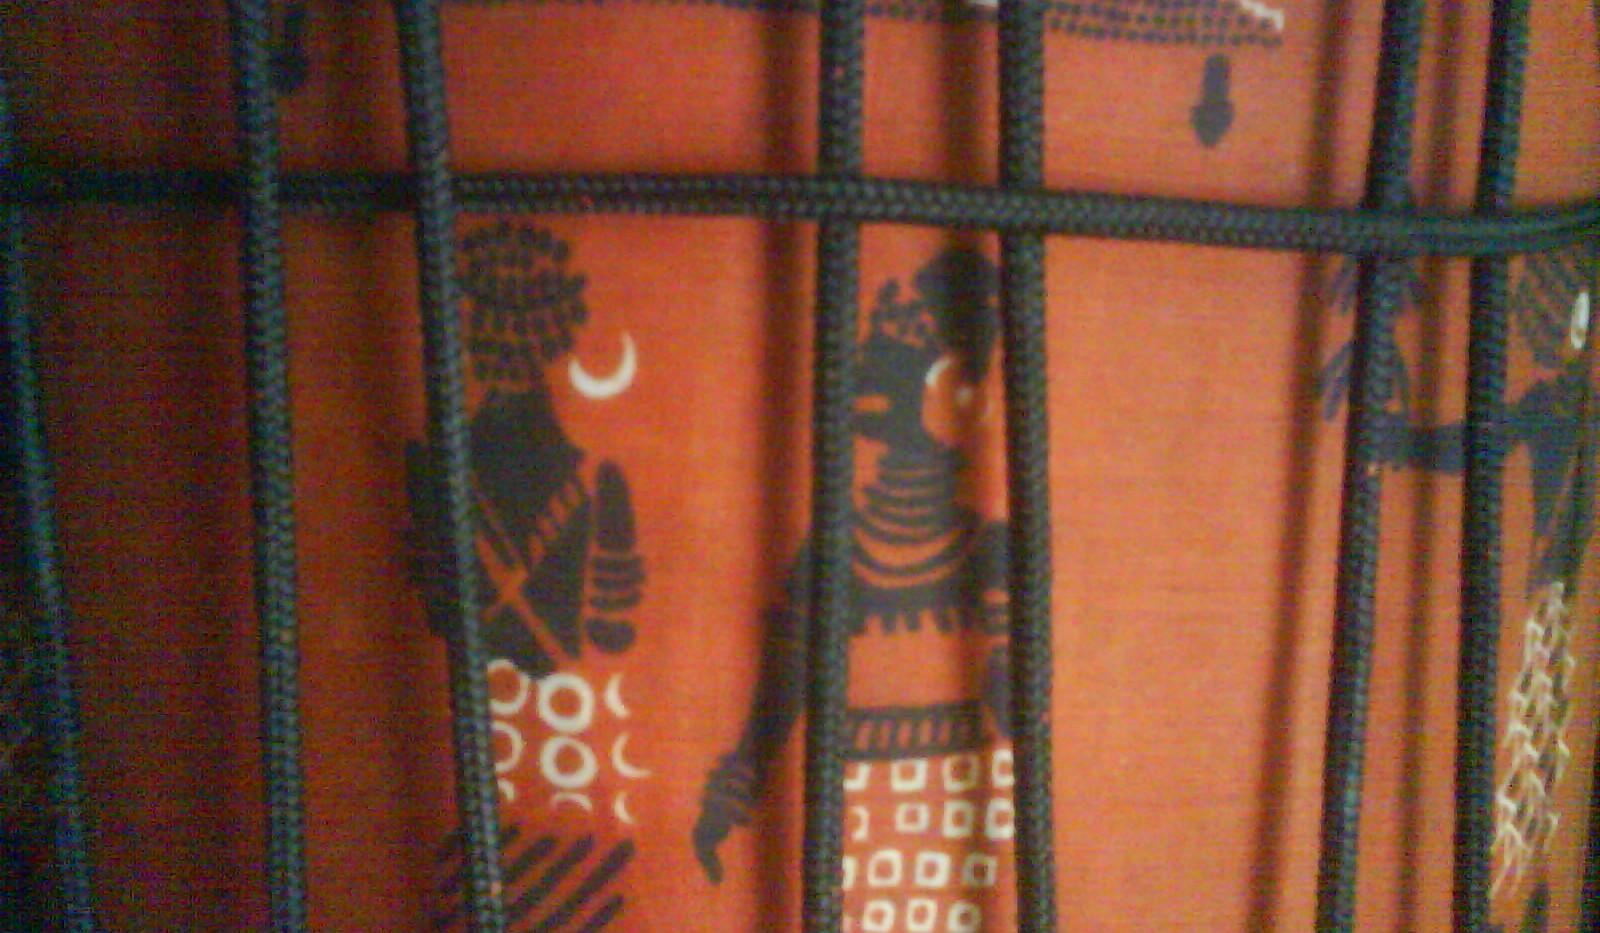 Fabric type2